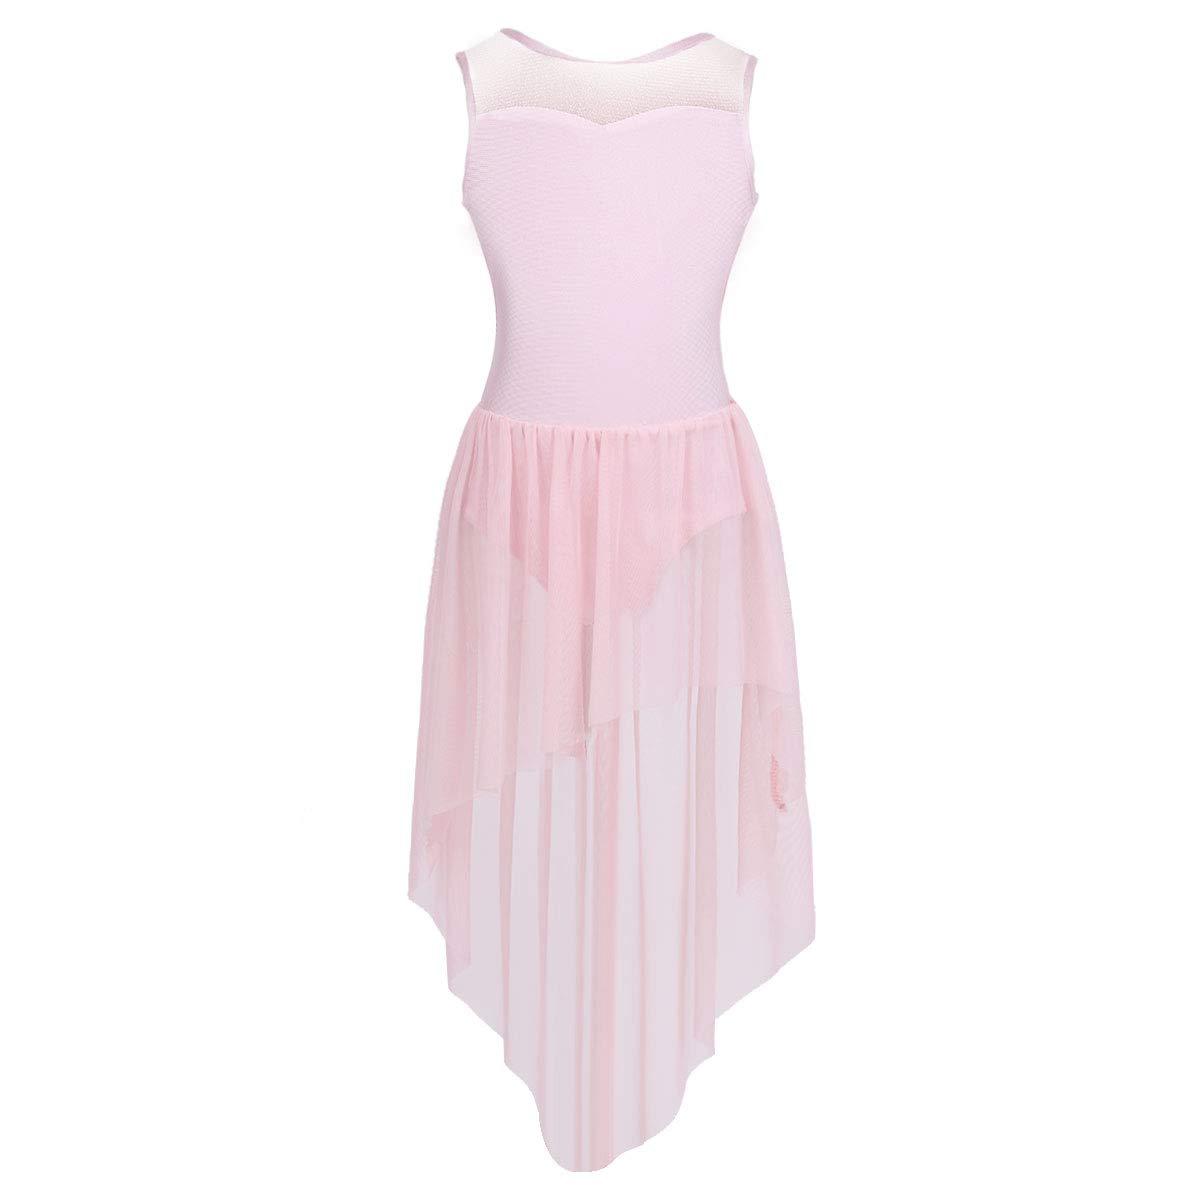 ACSUSS Kids Girls Camisole Ballet Tutu Dress Leotard Gymnastics Dance Bodysuit High Low Chiffon Skirt Dance Costume